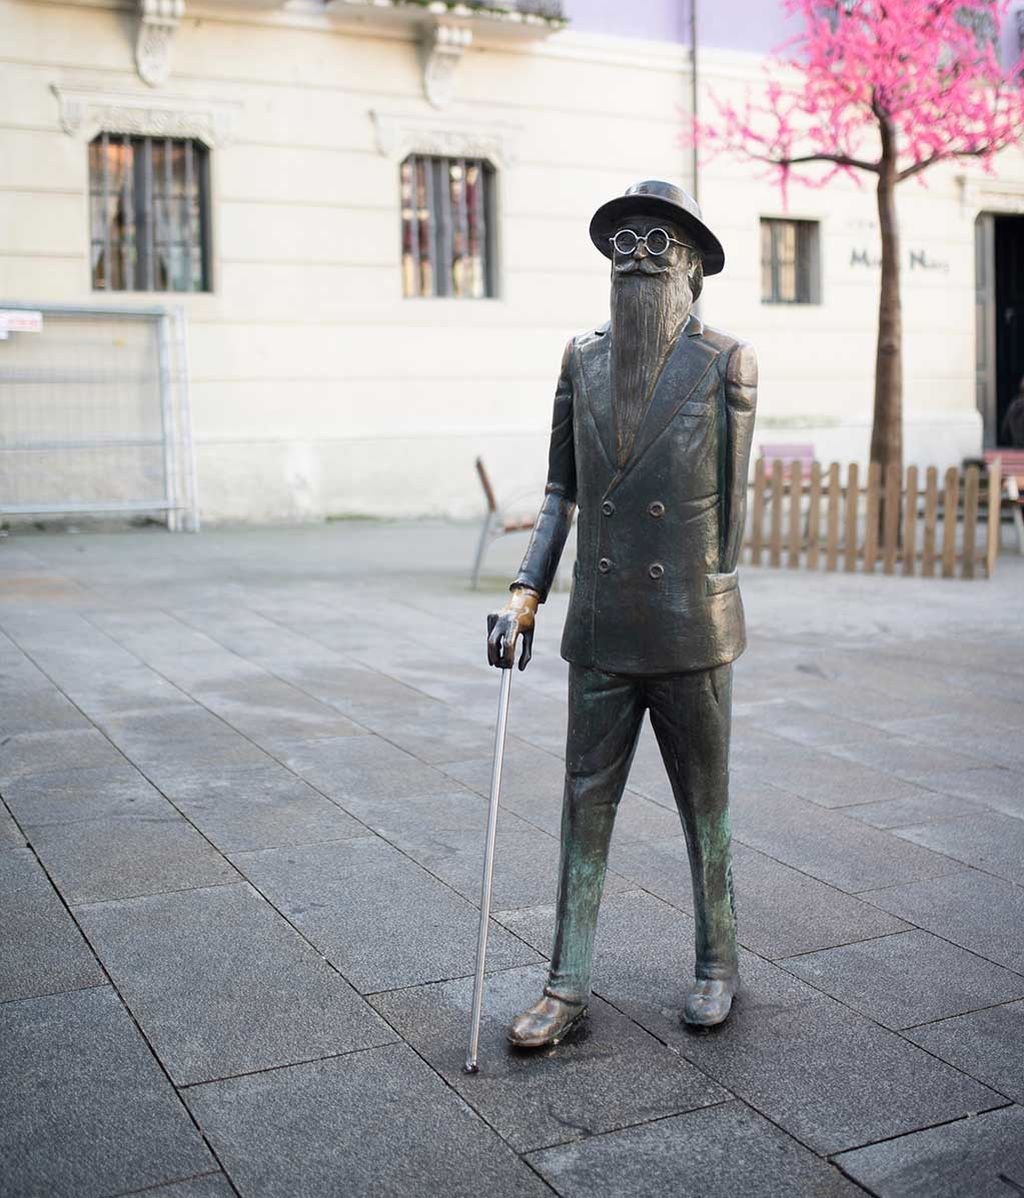 Estatua de Valle Inclán en la plaza de Méndez Núñez